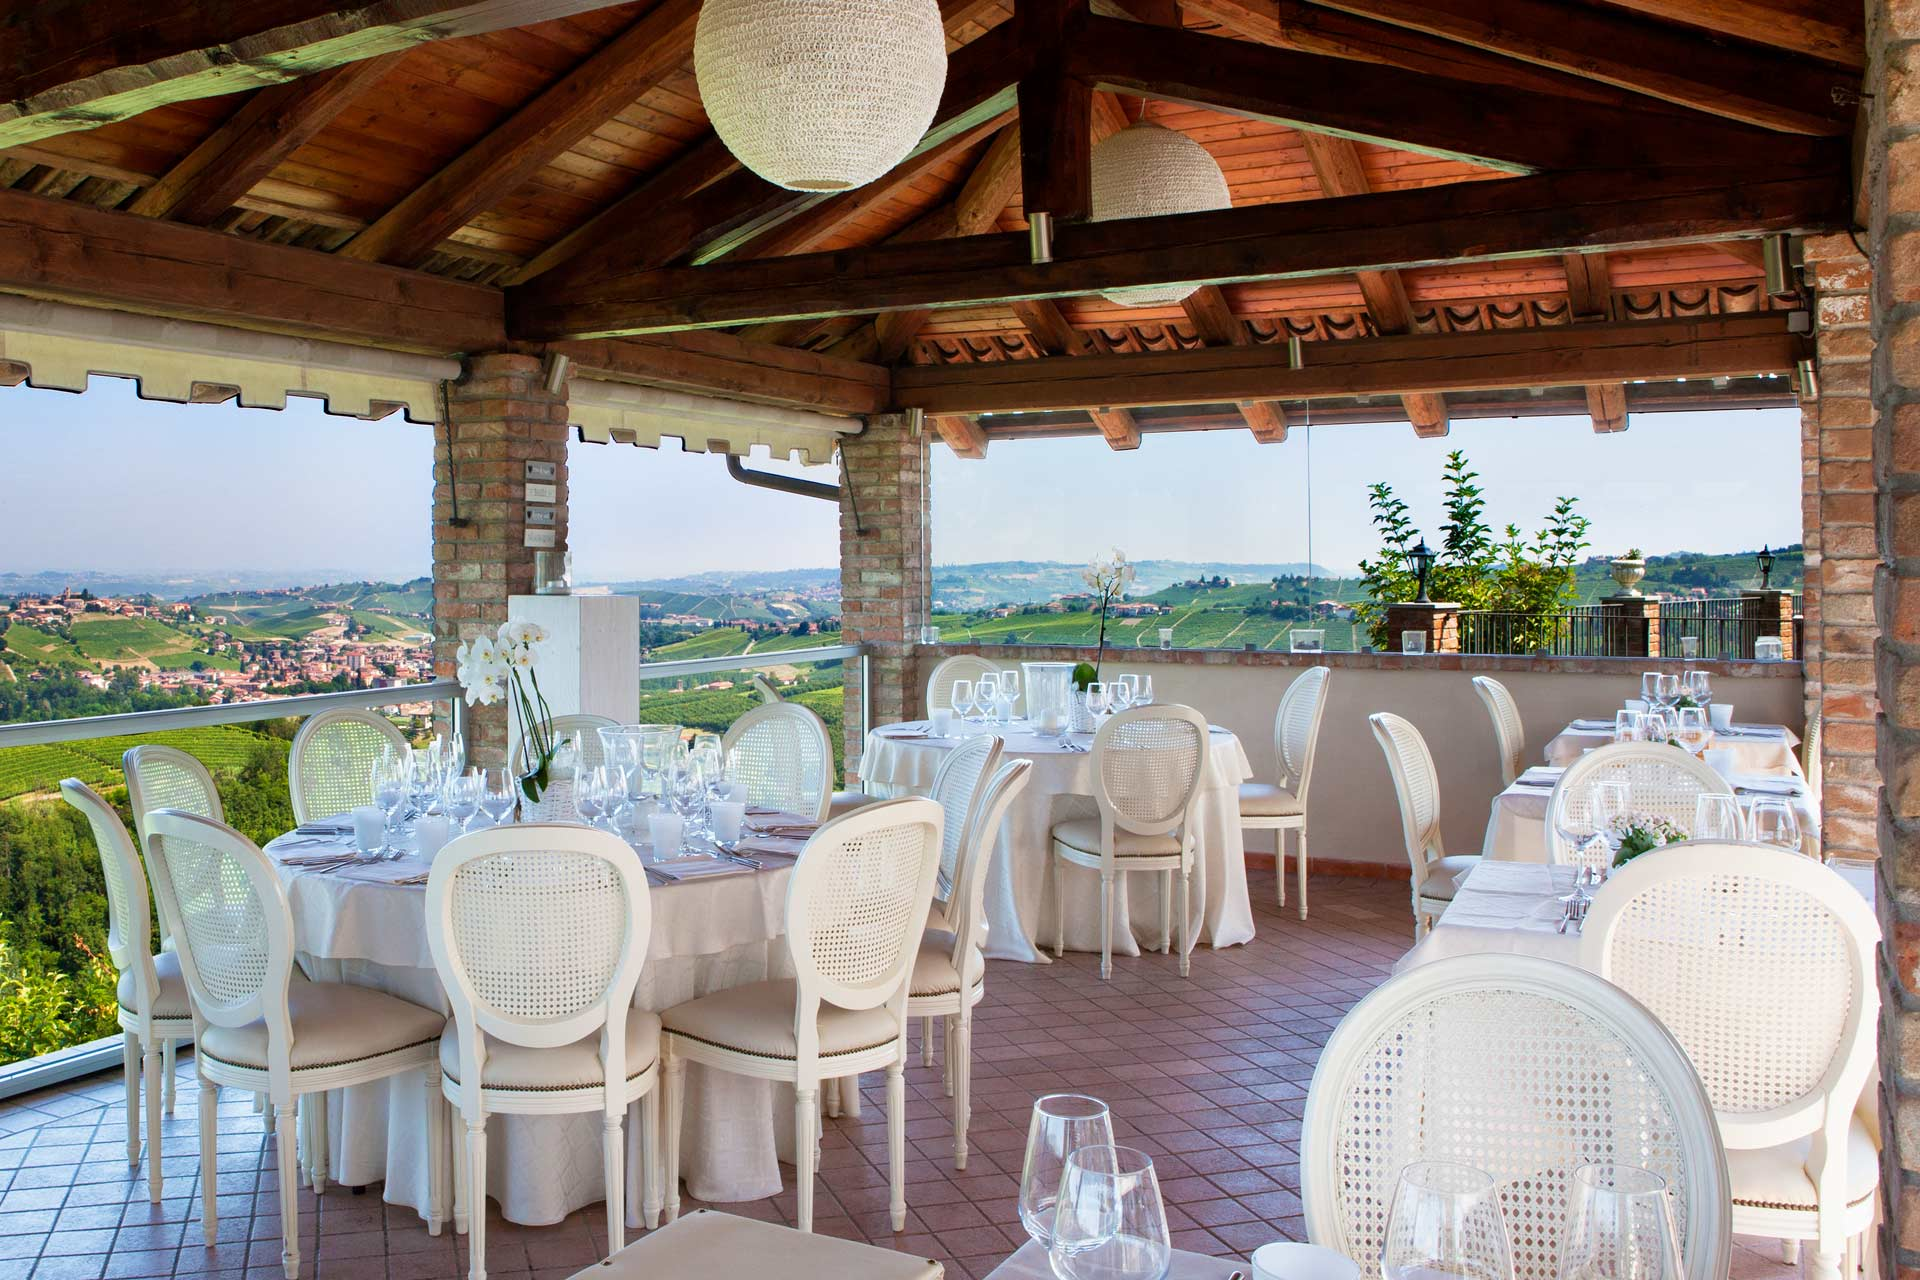 sangiorgio-ristorante-background